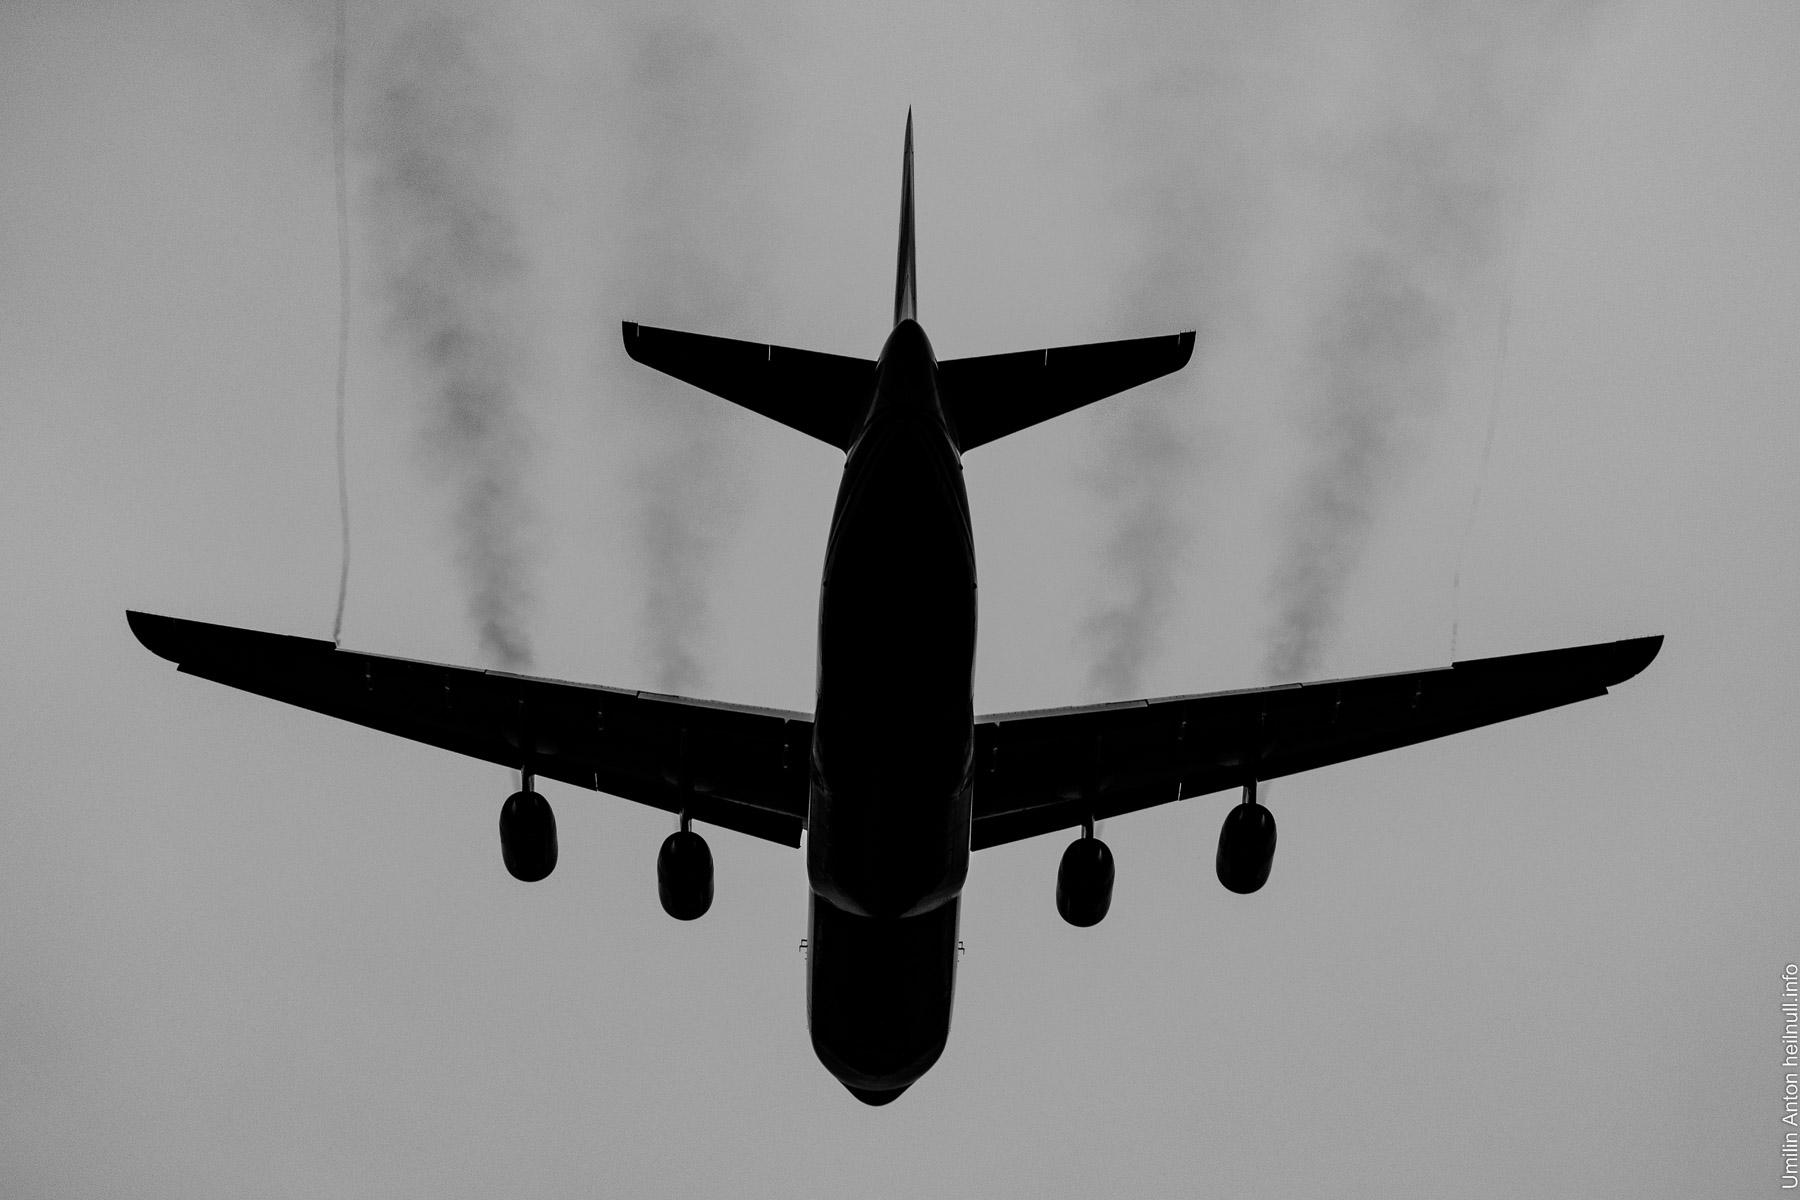 UAY_4255-8